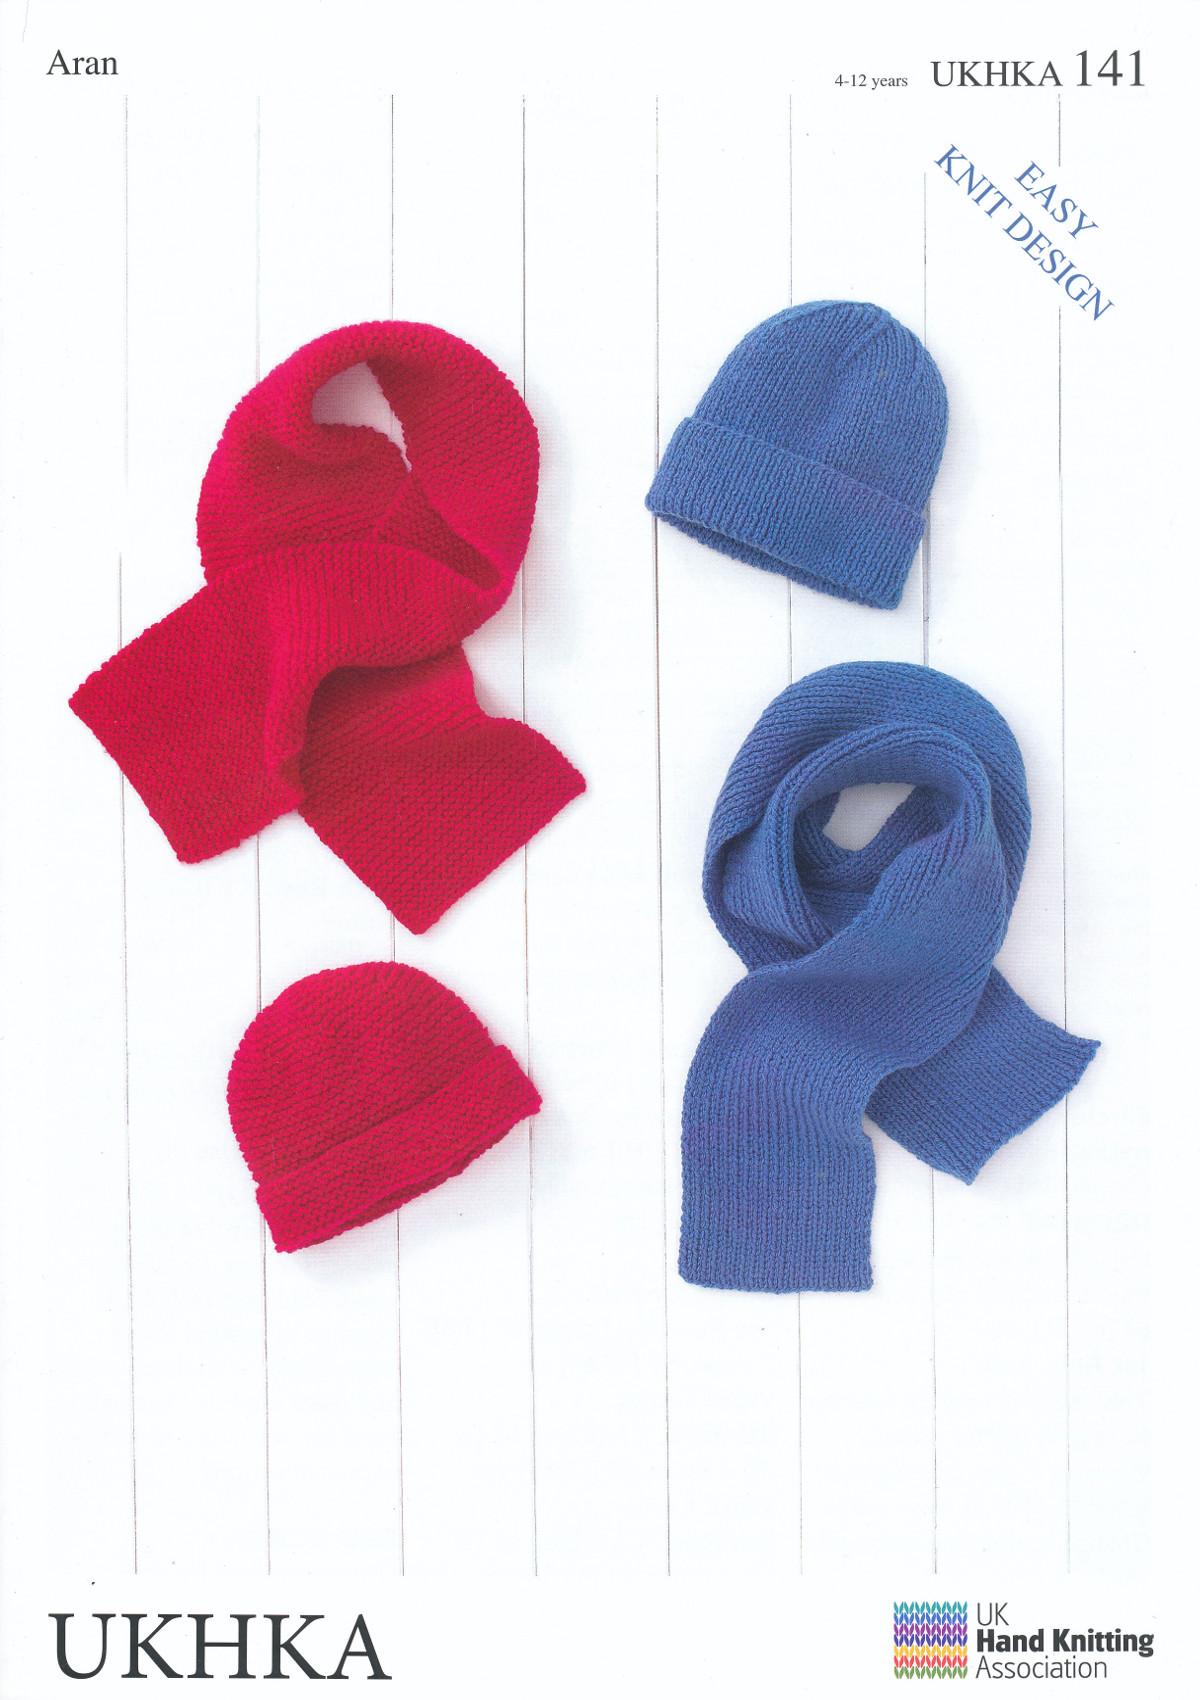 Aran Yarn Knitting Pattern Ukhka 141 For Easy Knit Kids Childrens